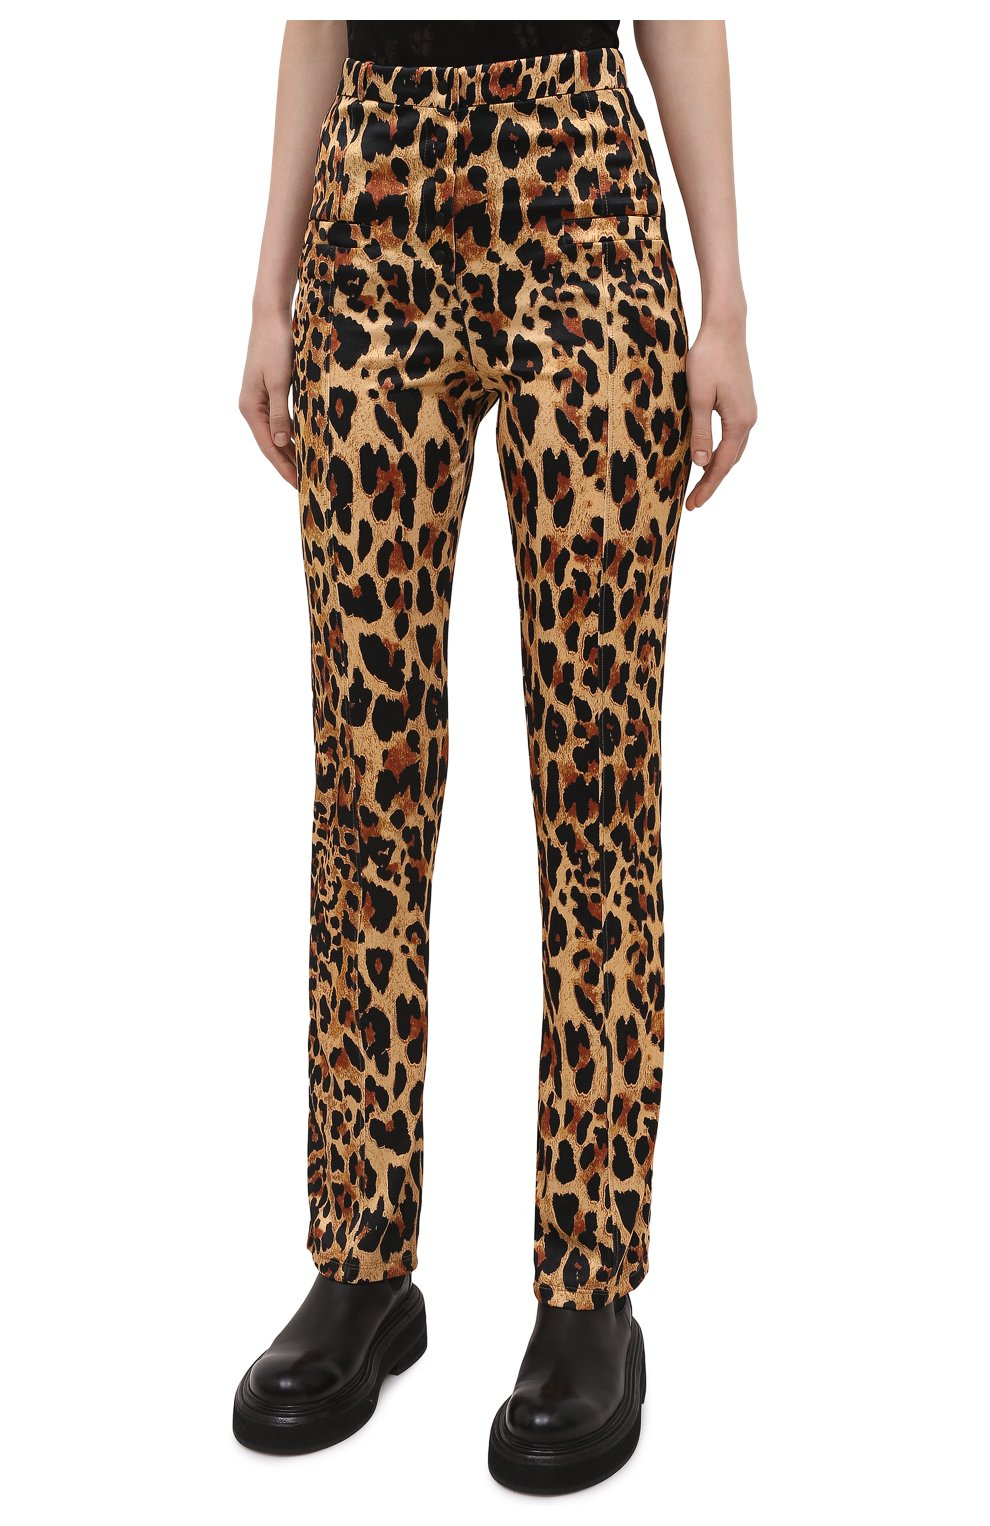 Женские брюки из вискозы PACO RABANNE леопардового цвета, арт. 21EJPA122VI0231 | Фото 3